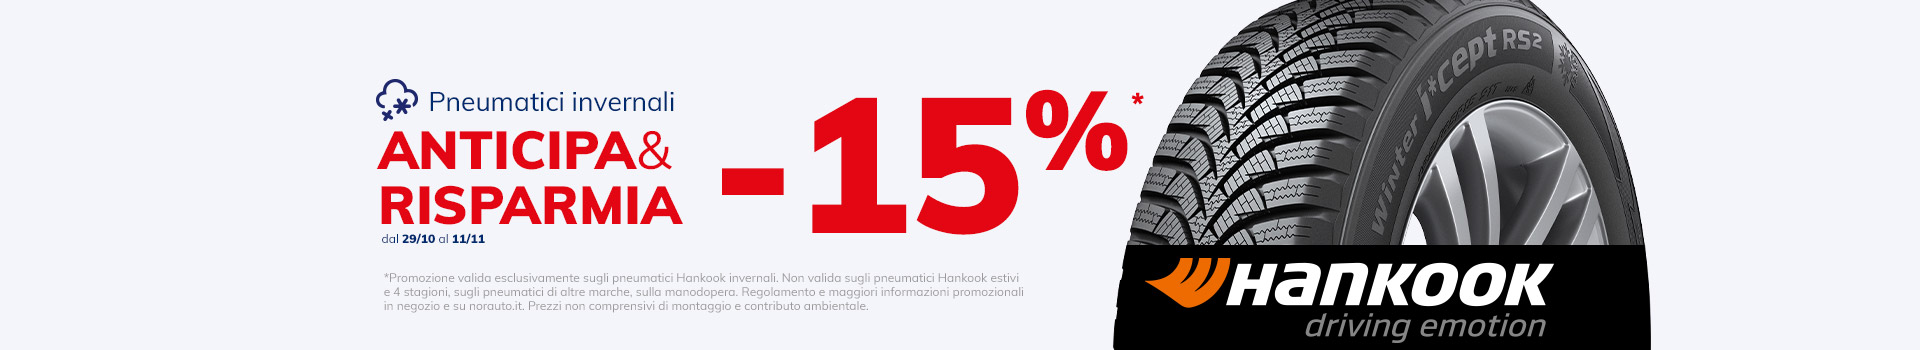 HANKOOK ANTICIPA E RISPARMIA -15%